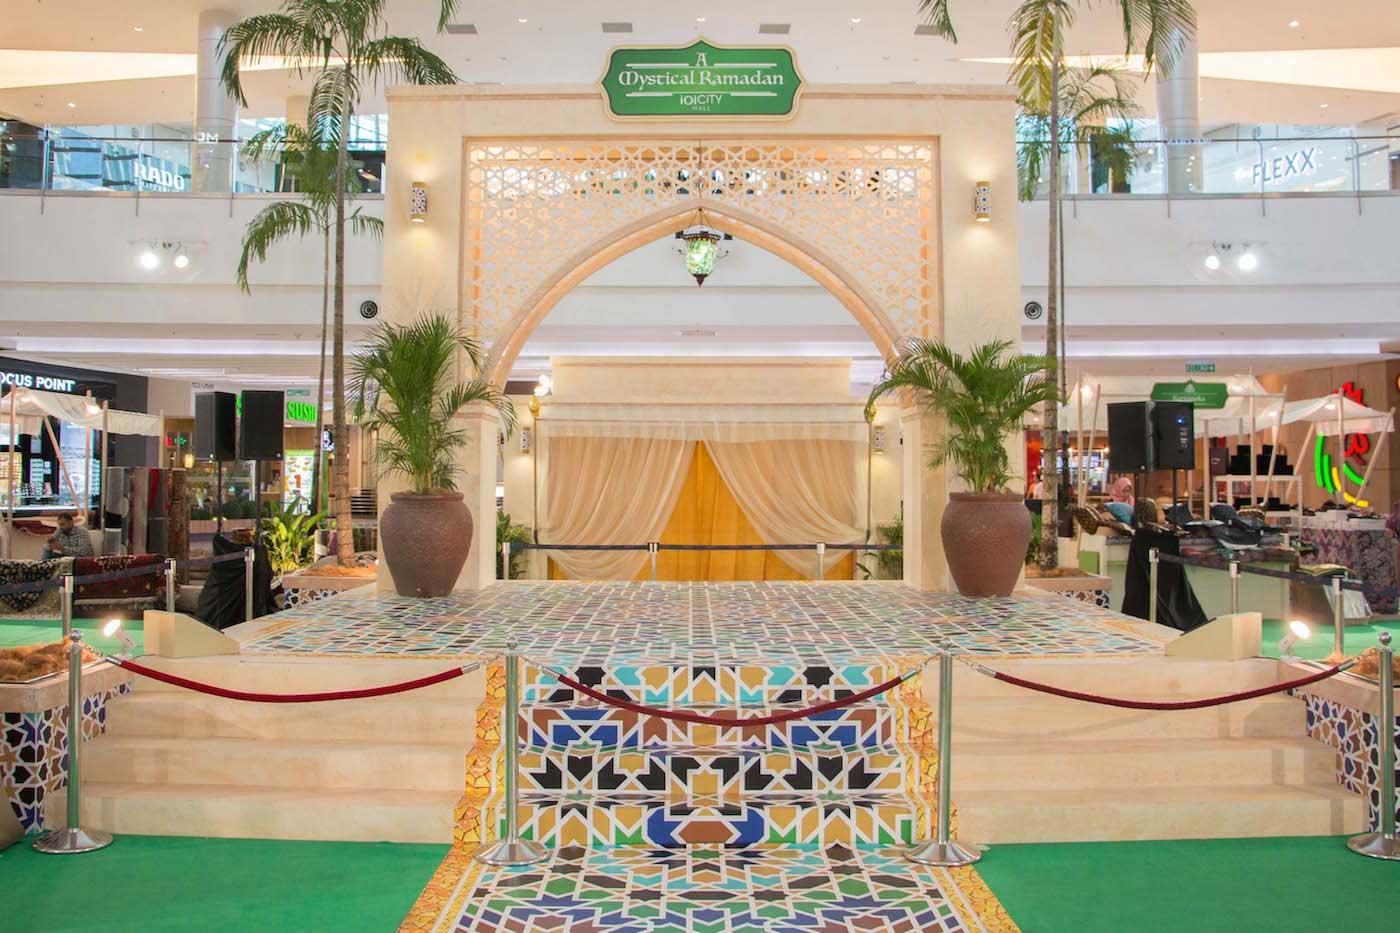 Jasa dekorasi ramadhan harga murah